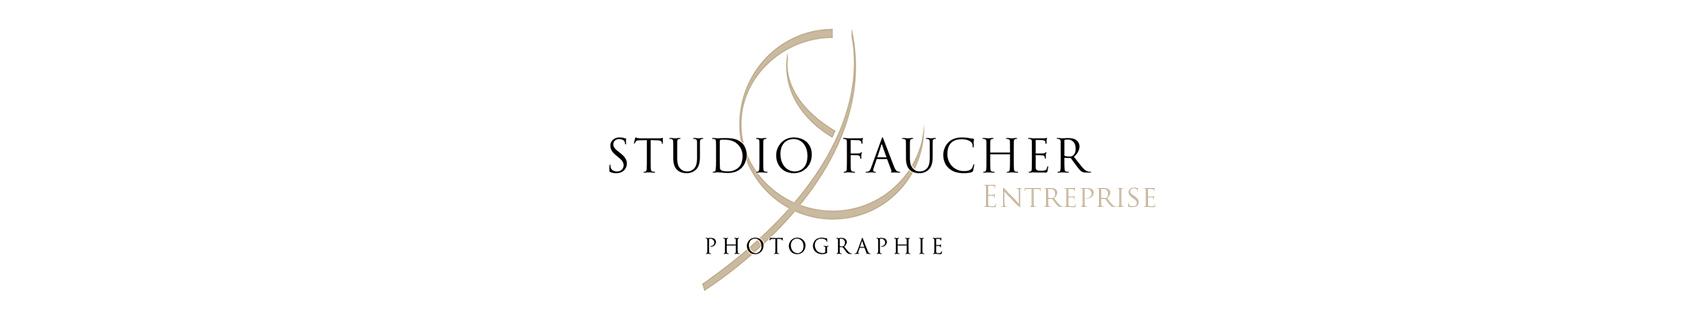 Studio Faucher Entreprise